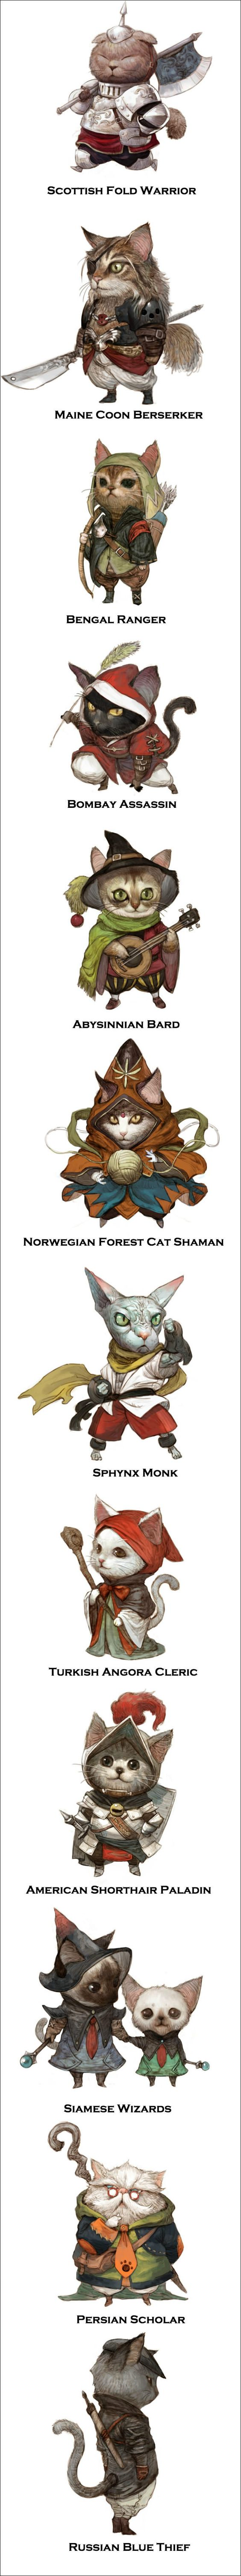 f9acc34936663efd58a88d17eab305cc--gamer-cat-cat-species Spannende 40 Fuß Meter Dekorationen